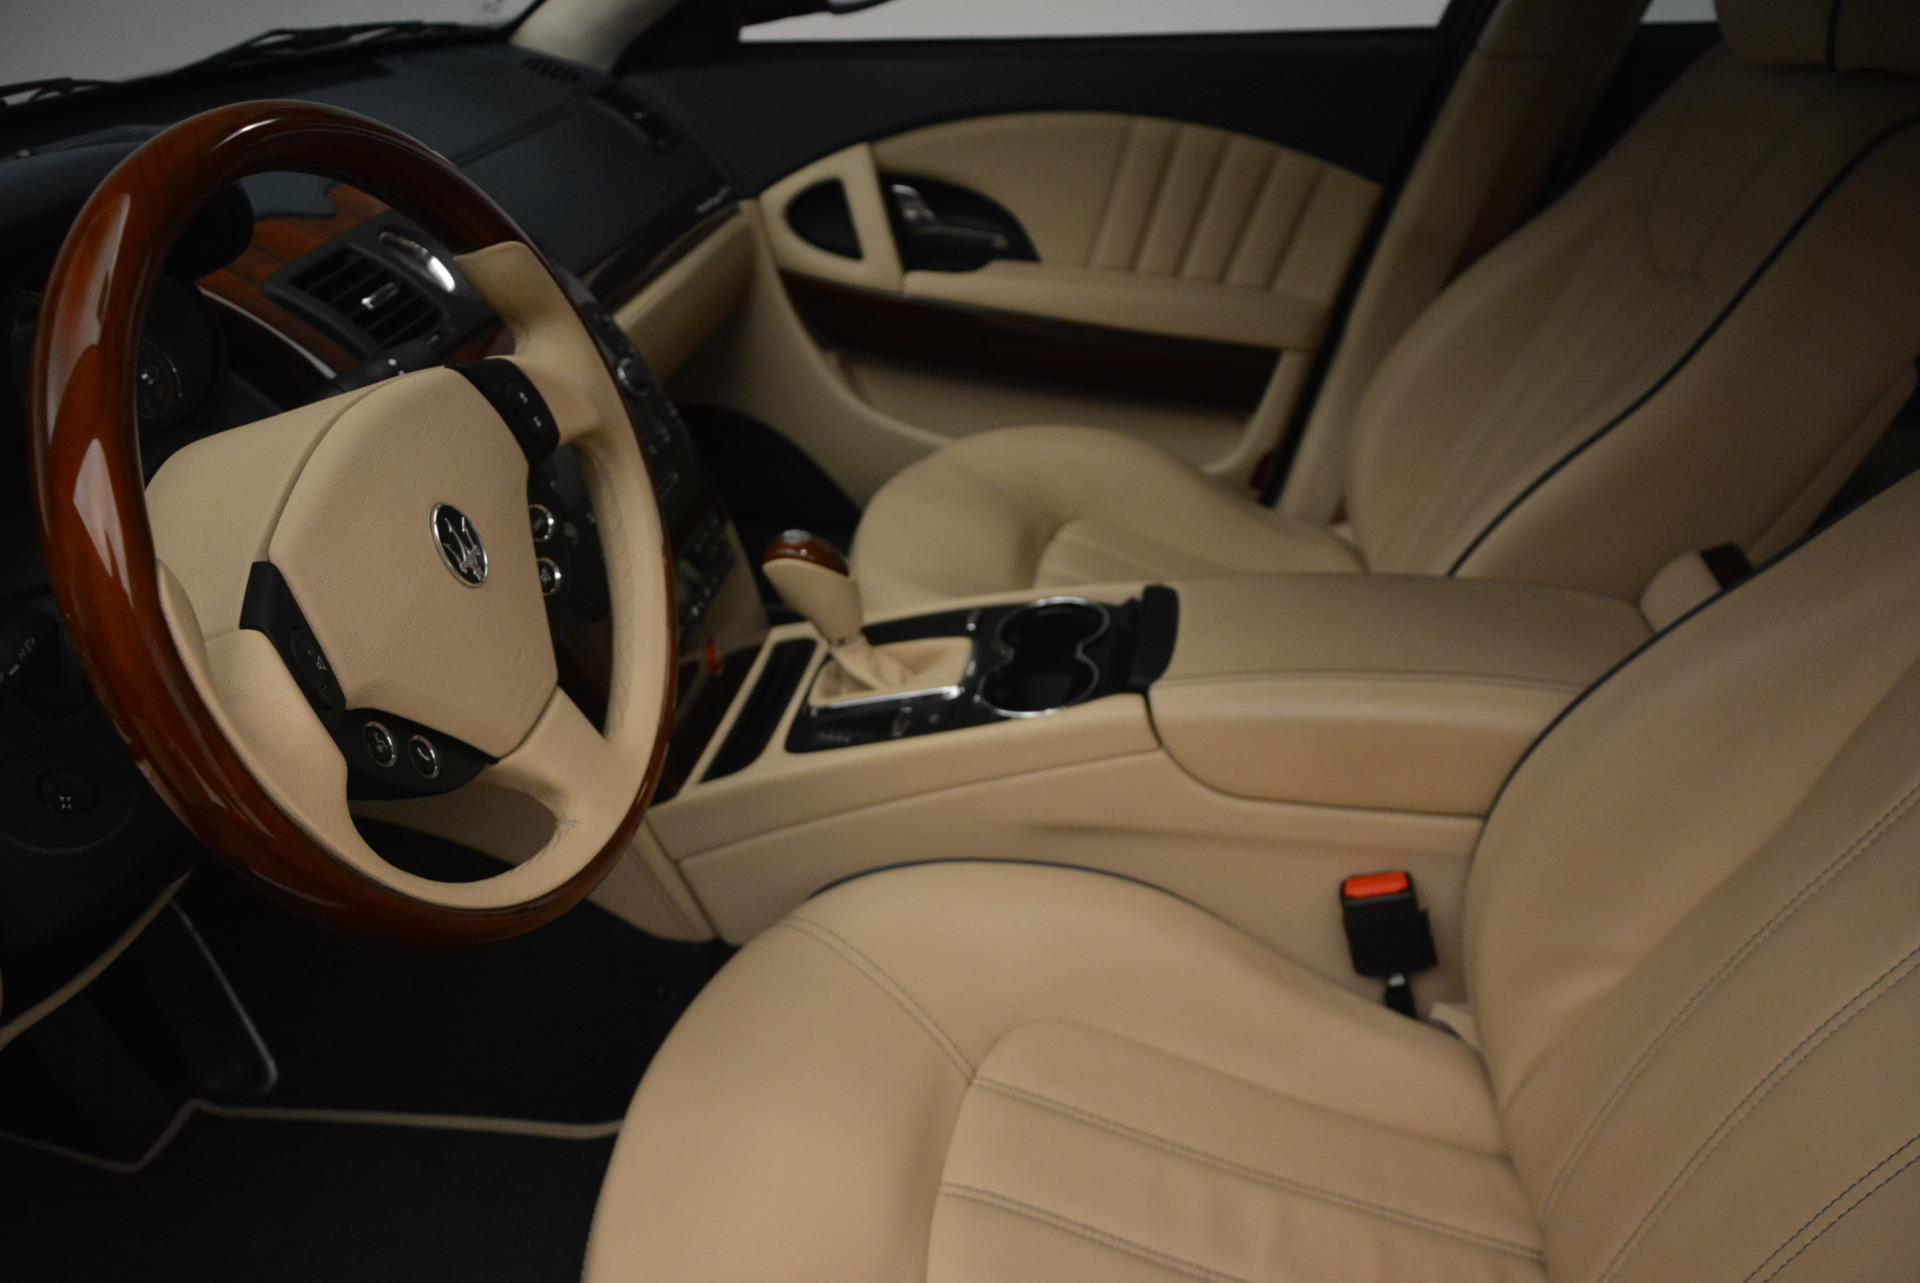 Used 2010 Maserati Quattroporte S For Sale In Westport, CT 795_p14